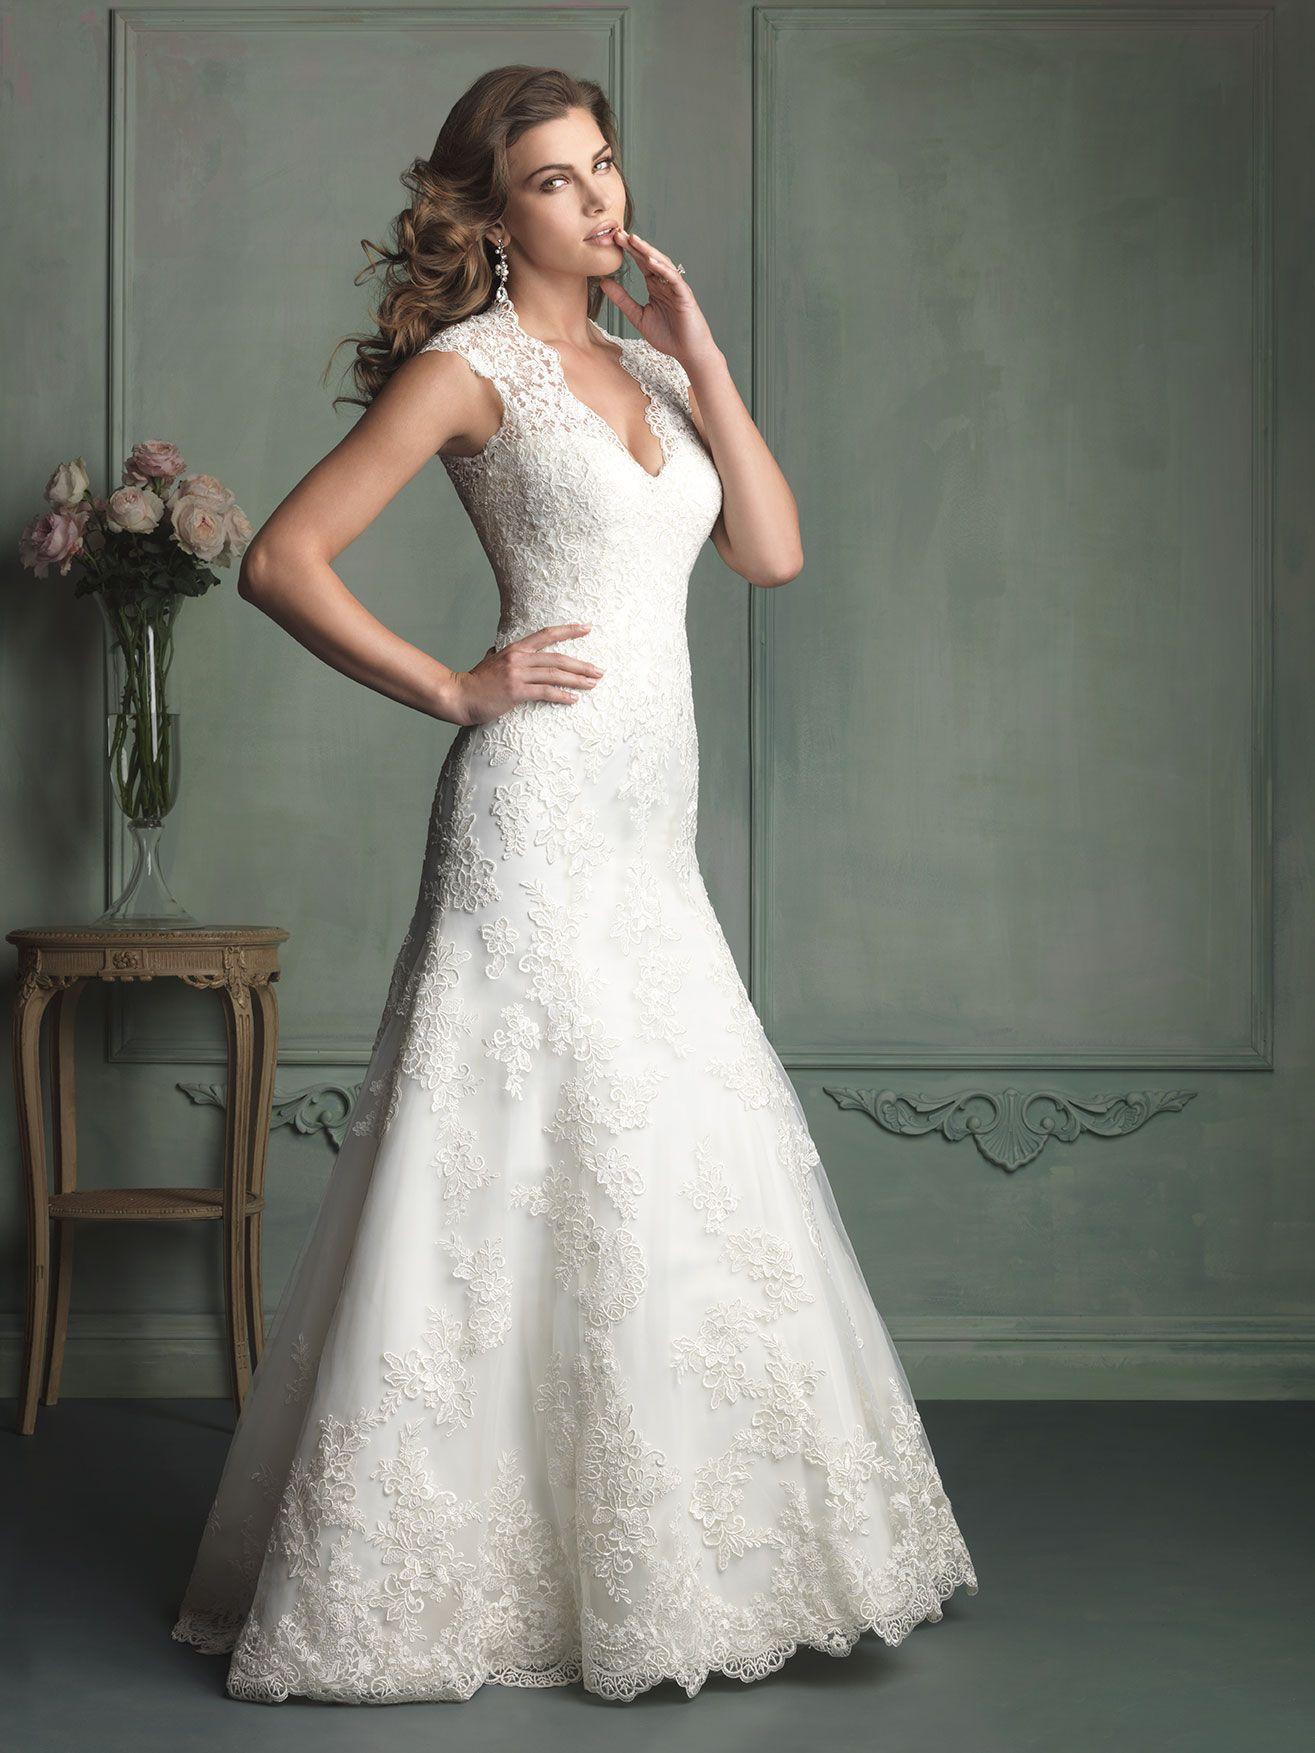 Allure Bridals 9113 Online Wedding Dress Wedding Dresses Allure Bridal